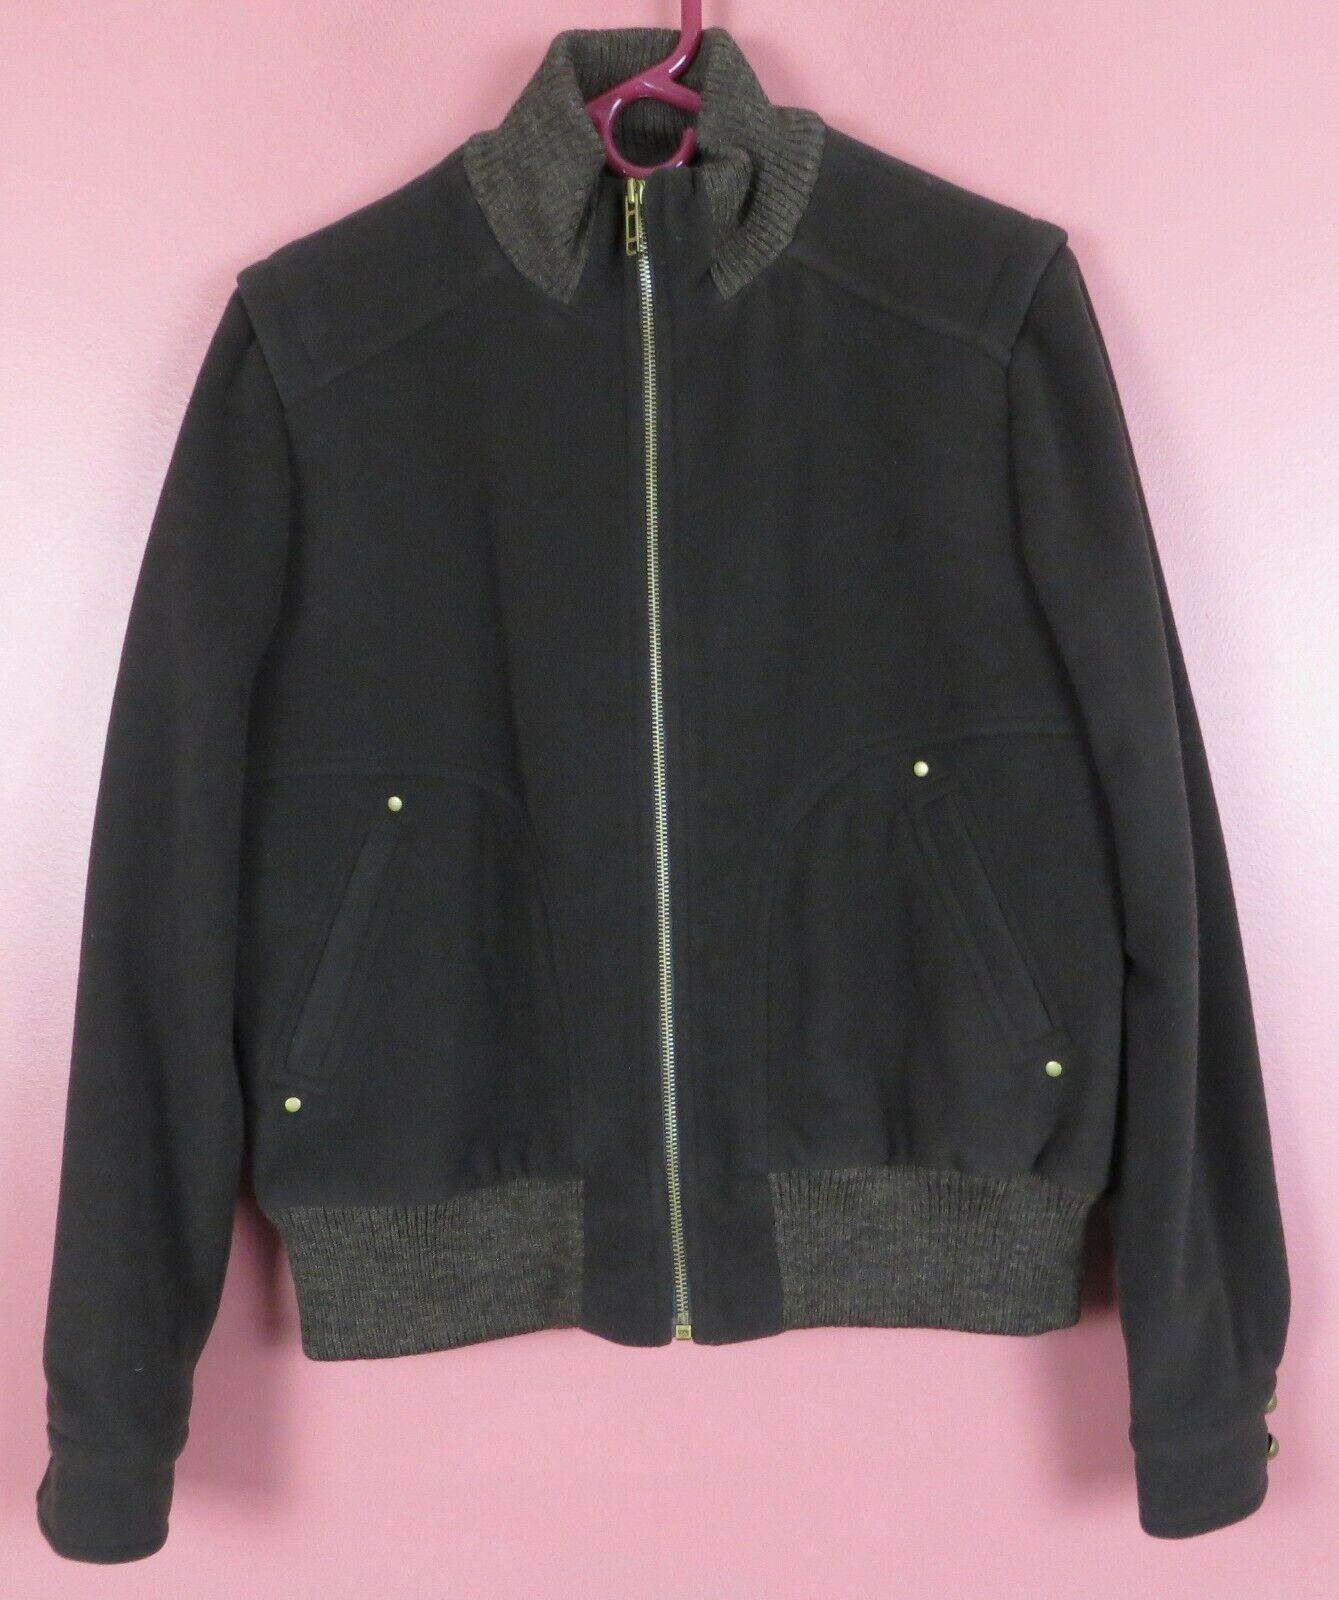 CJ0761- TALBOTS Women's 70% Wool 10% Cashmere Flannel Jacket Thick Warm Brown L